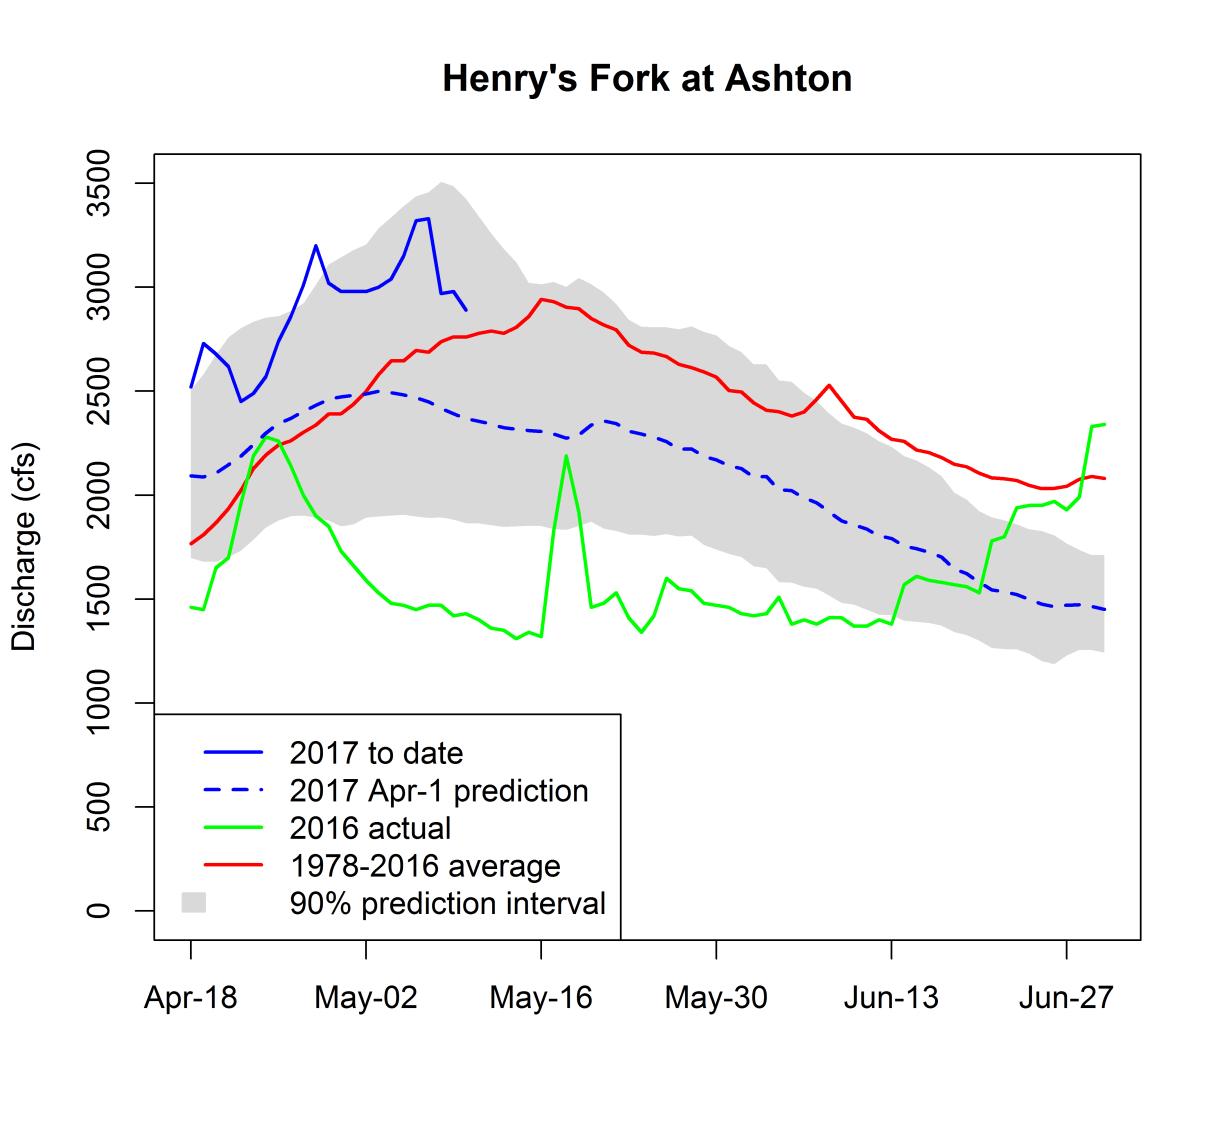 Graph of flow in Henry's Fork at Ashton